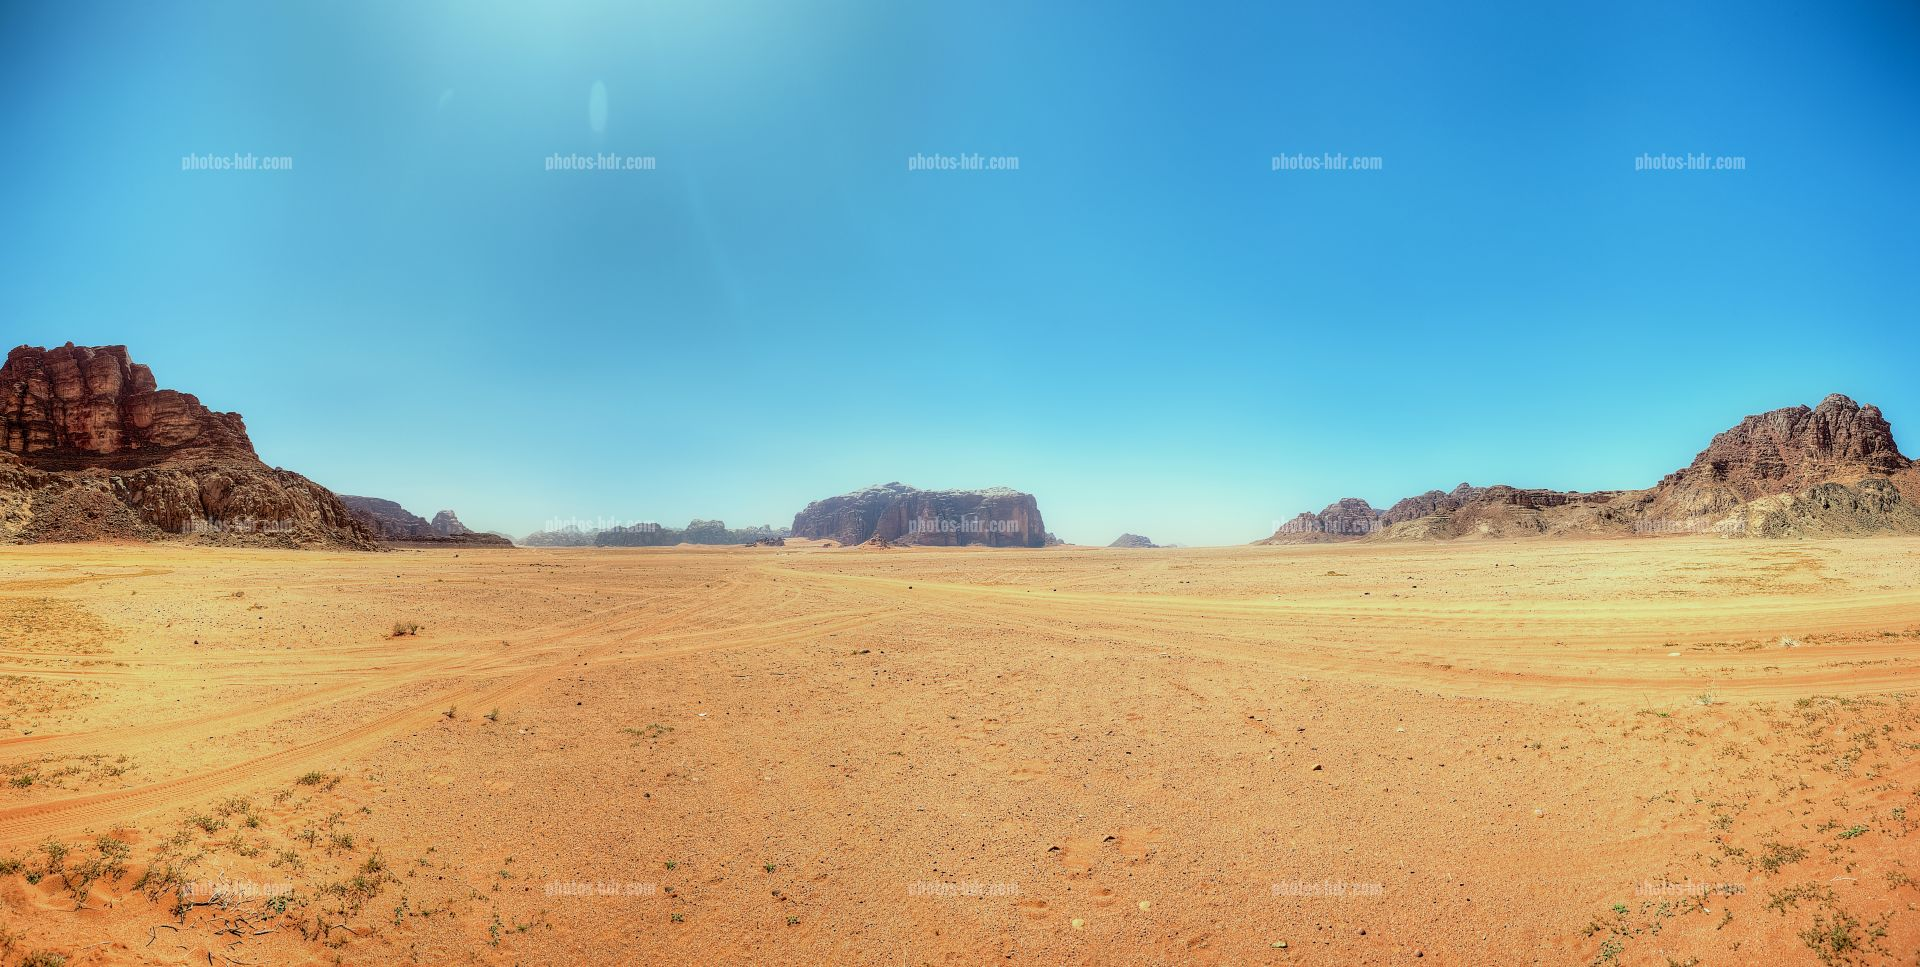 Xxx Desert Pictures 57